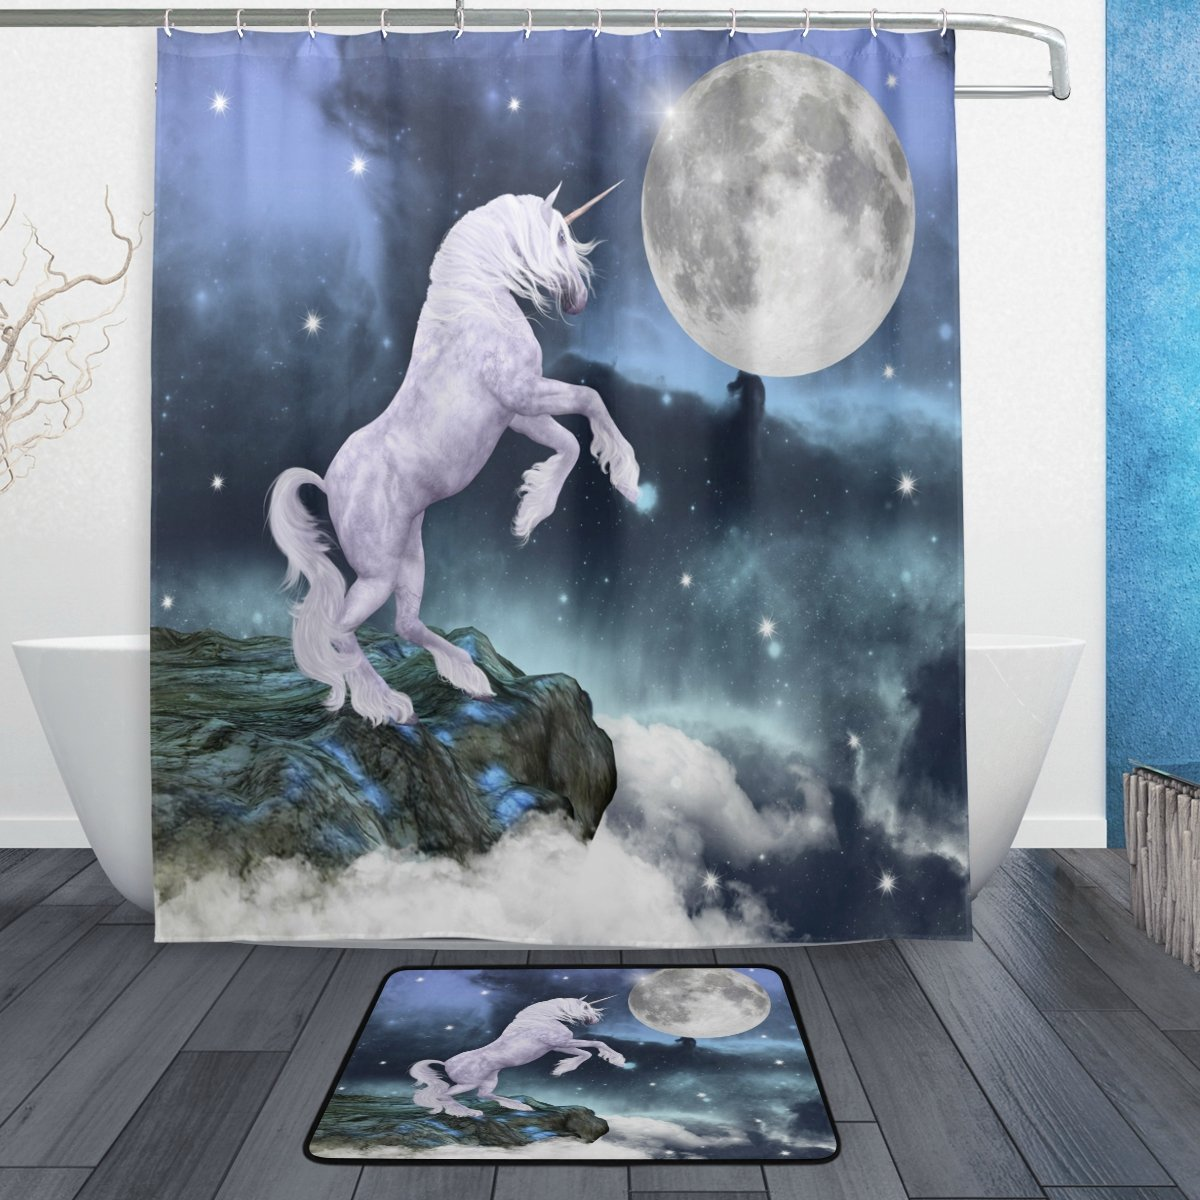 White Unicorn Full Moon Night Waterproof Polyester Fabric Shower Curtain with Hooks Doormat Bath Floor Mat Bathroom Home Decor